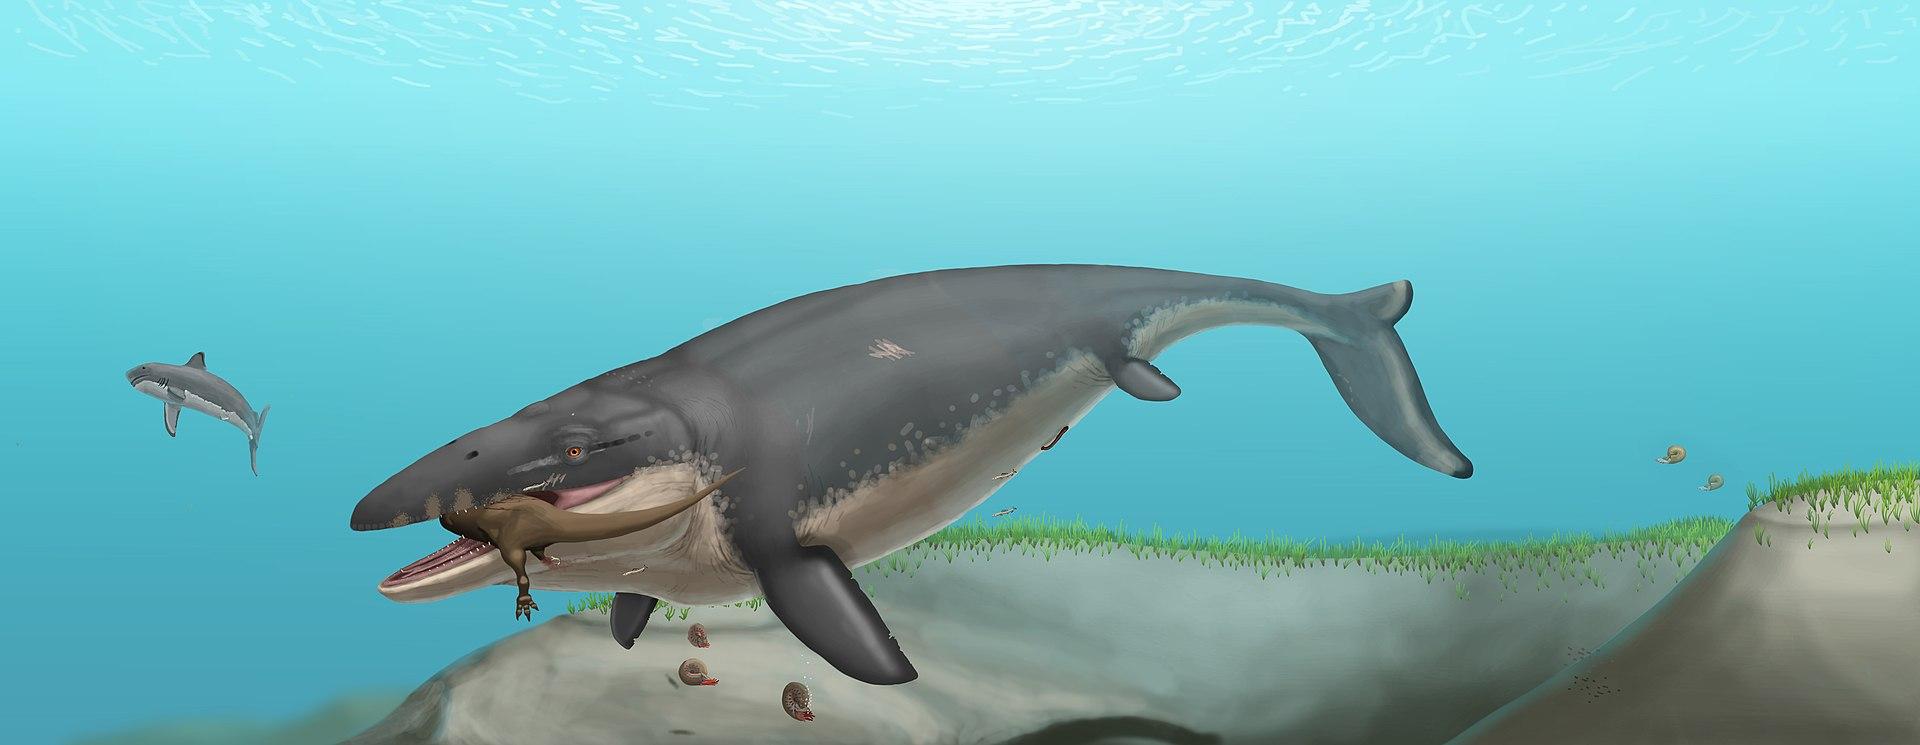 Mosasaurus Hoffmanni, largest mosasaur